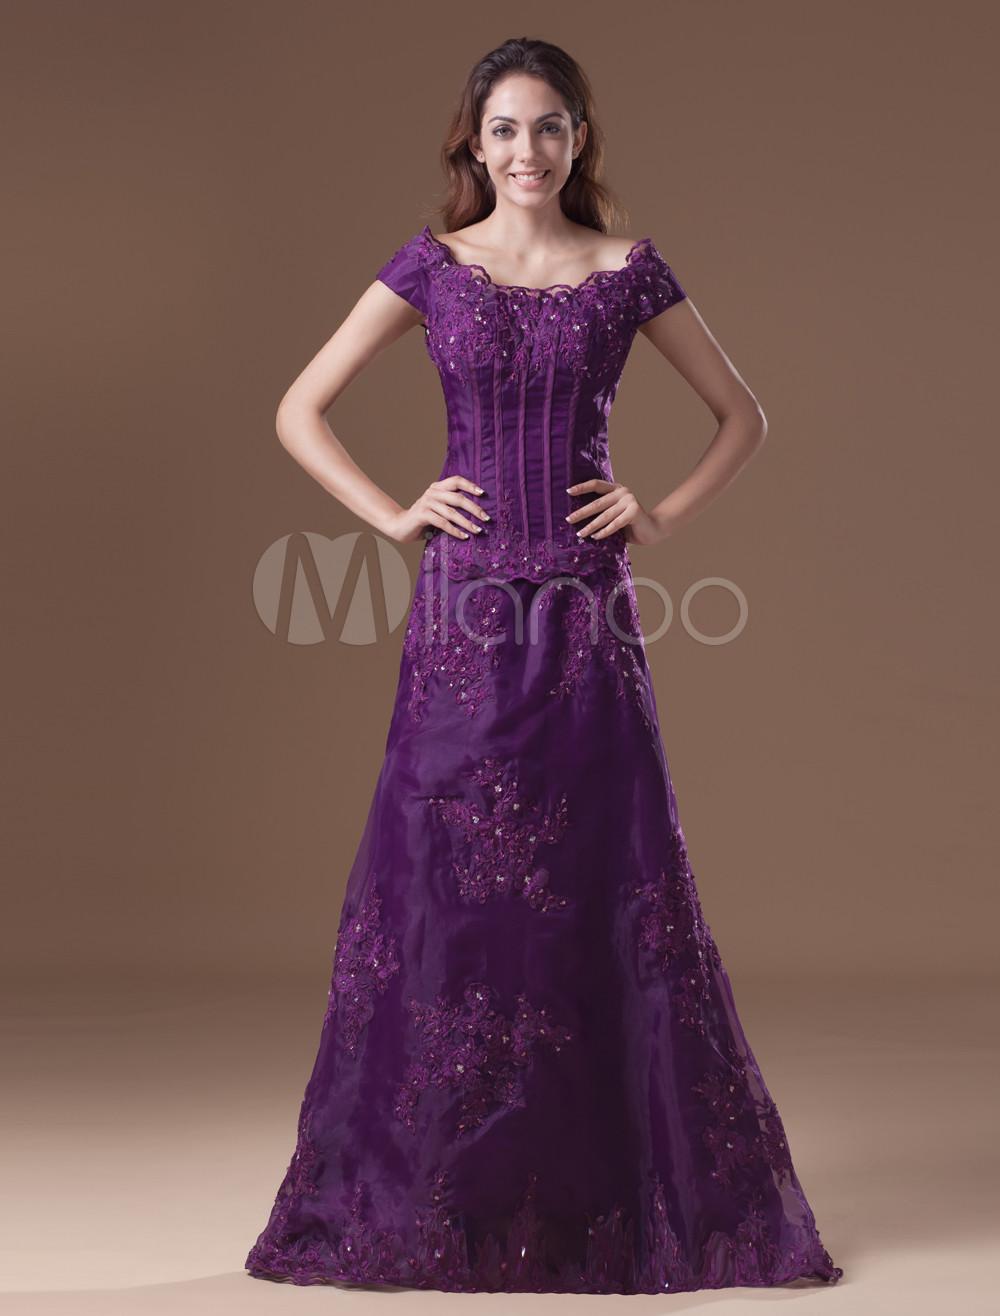 Lavender Evening Dress Organza Off The Shoulder Formal Dress Sleeveless Beading Court Train Occasion Dress